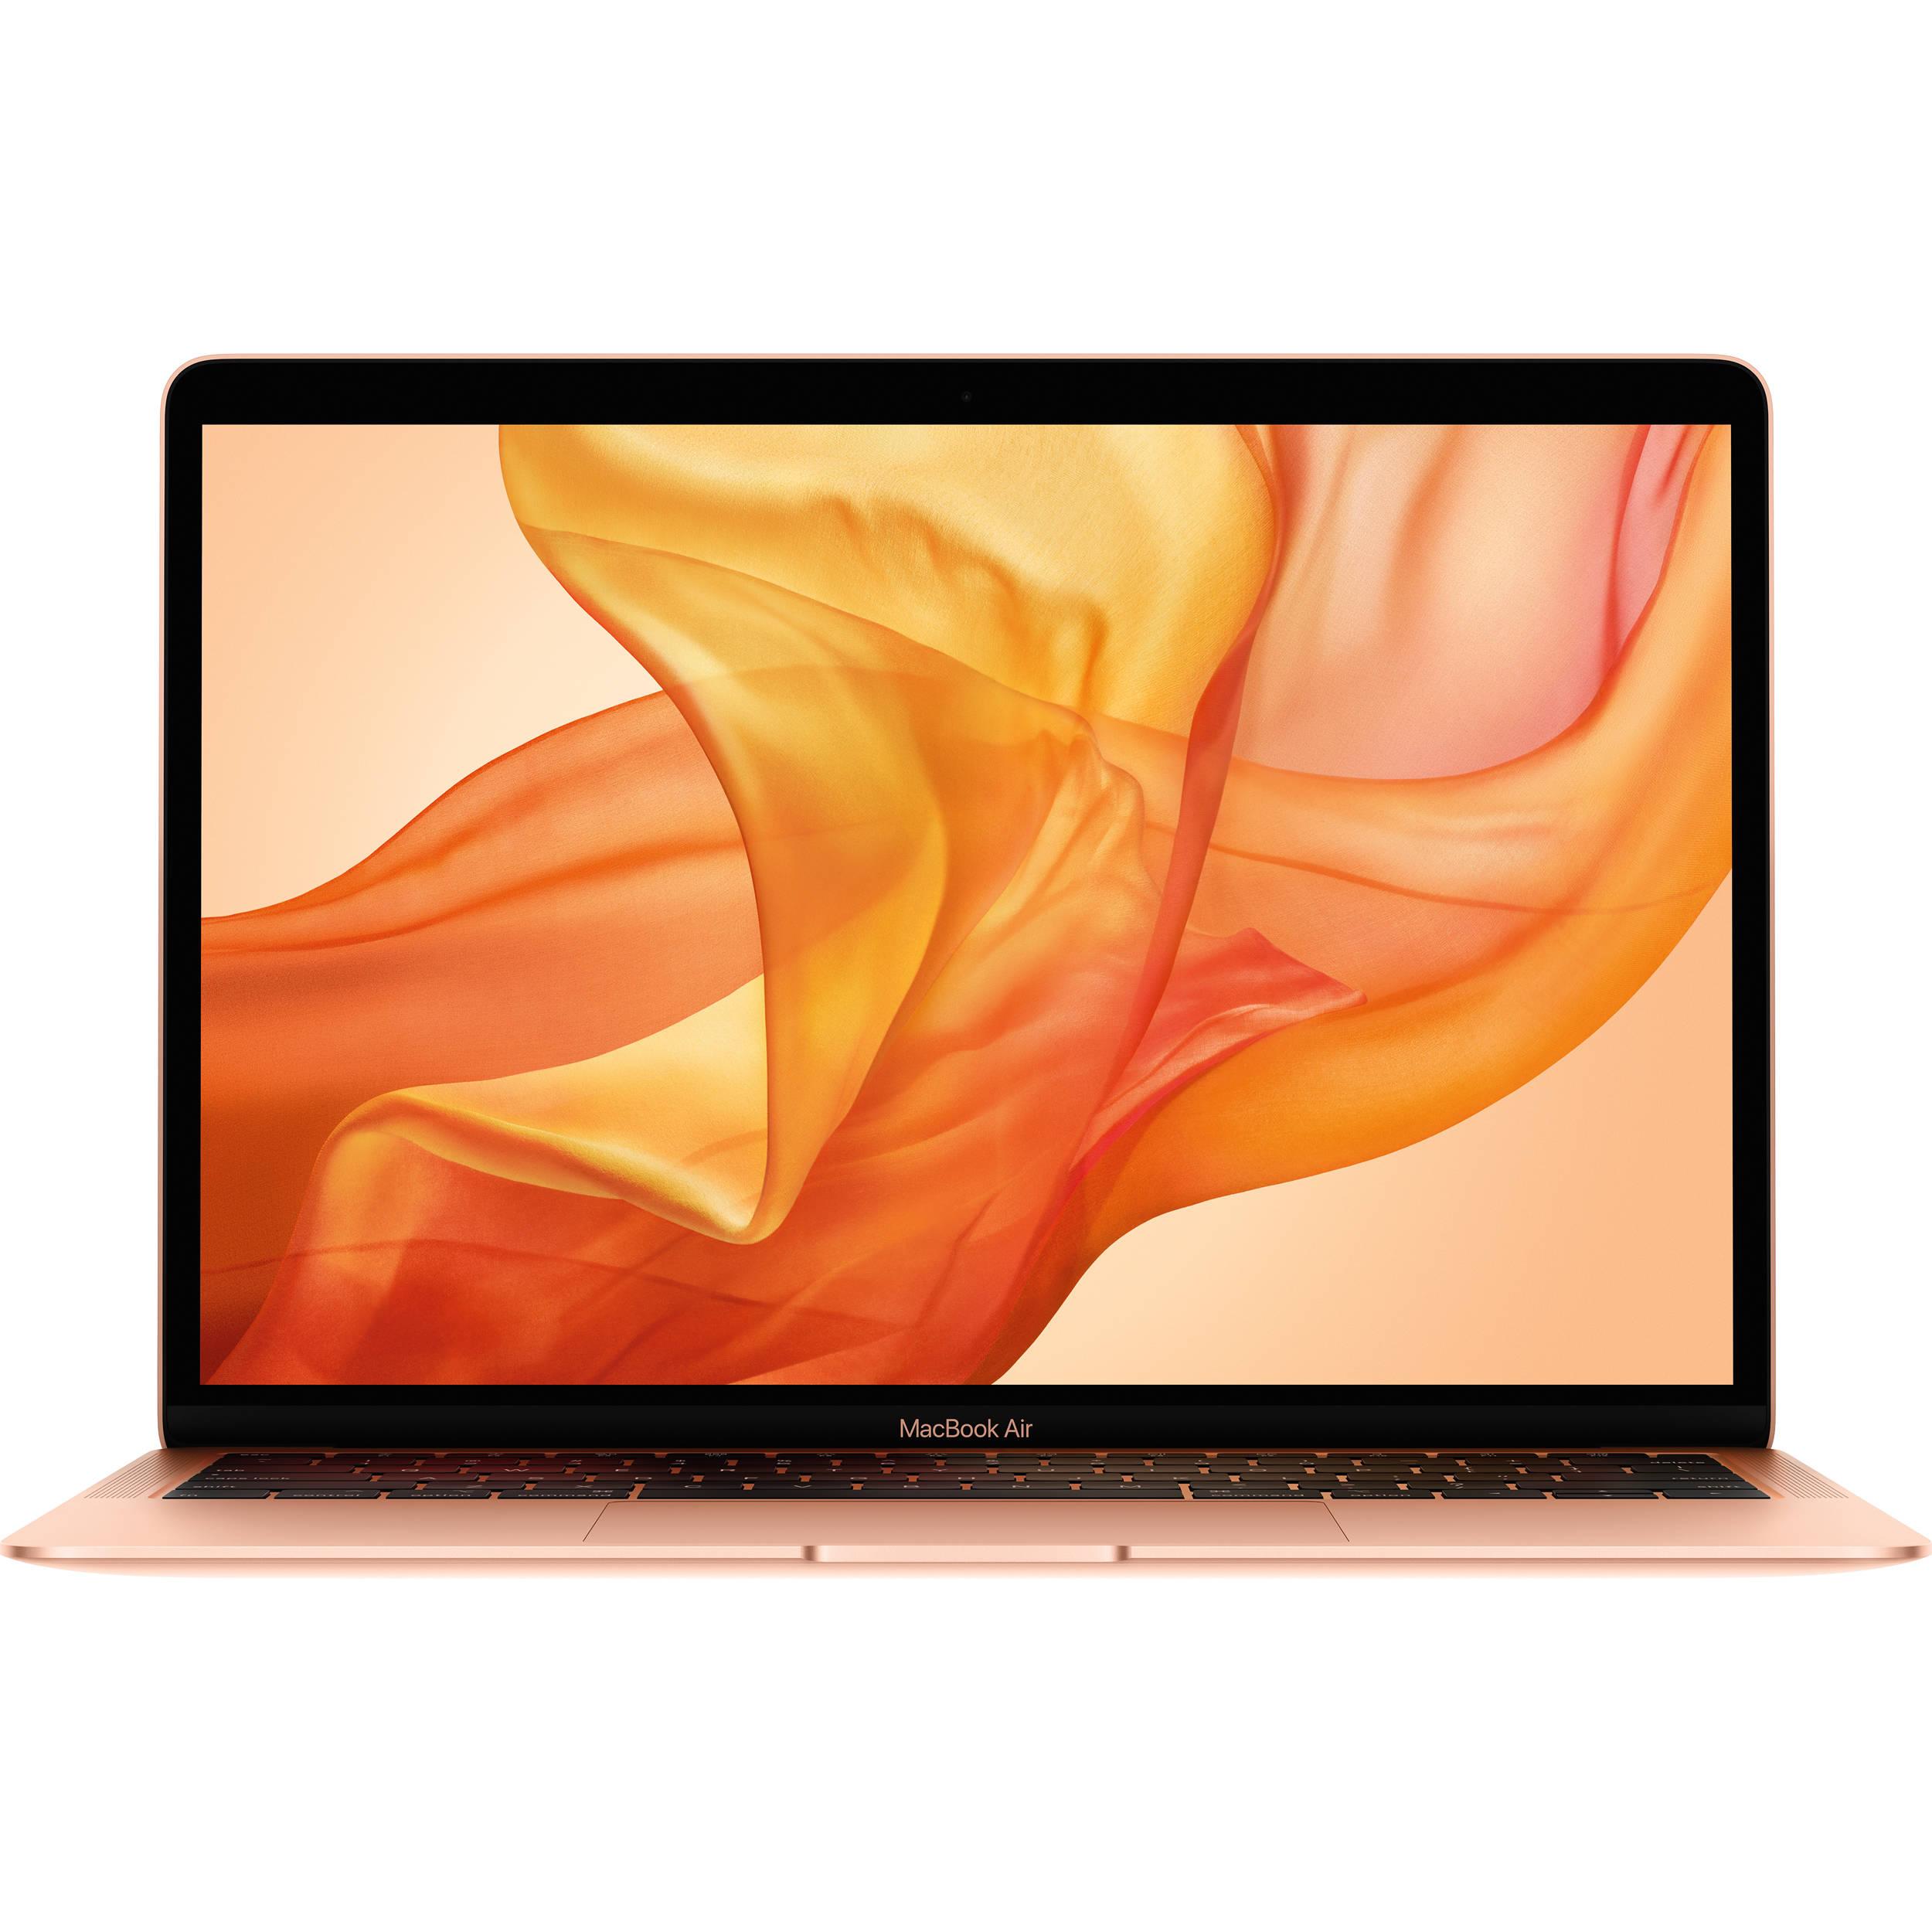 Macbook Air 13 Inch 2018 Core I5 8GB 256GB SSD - used